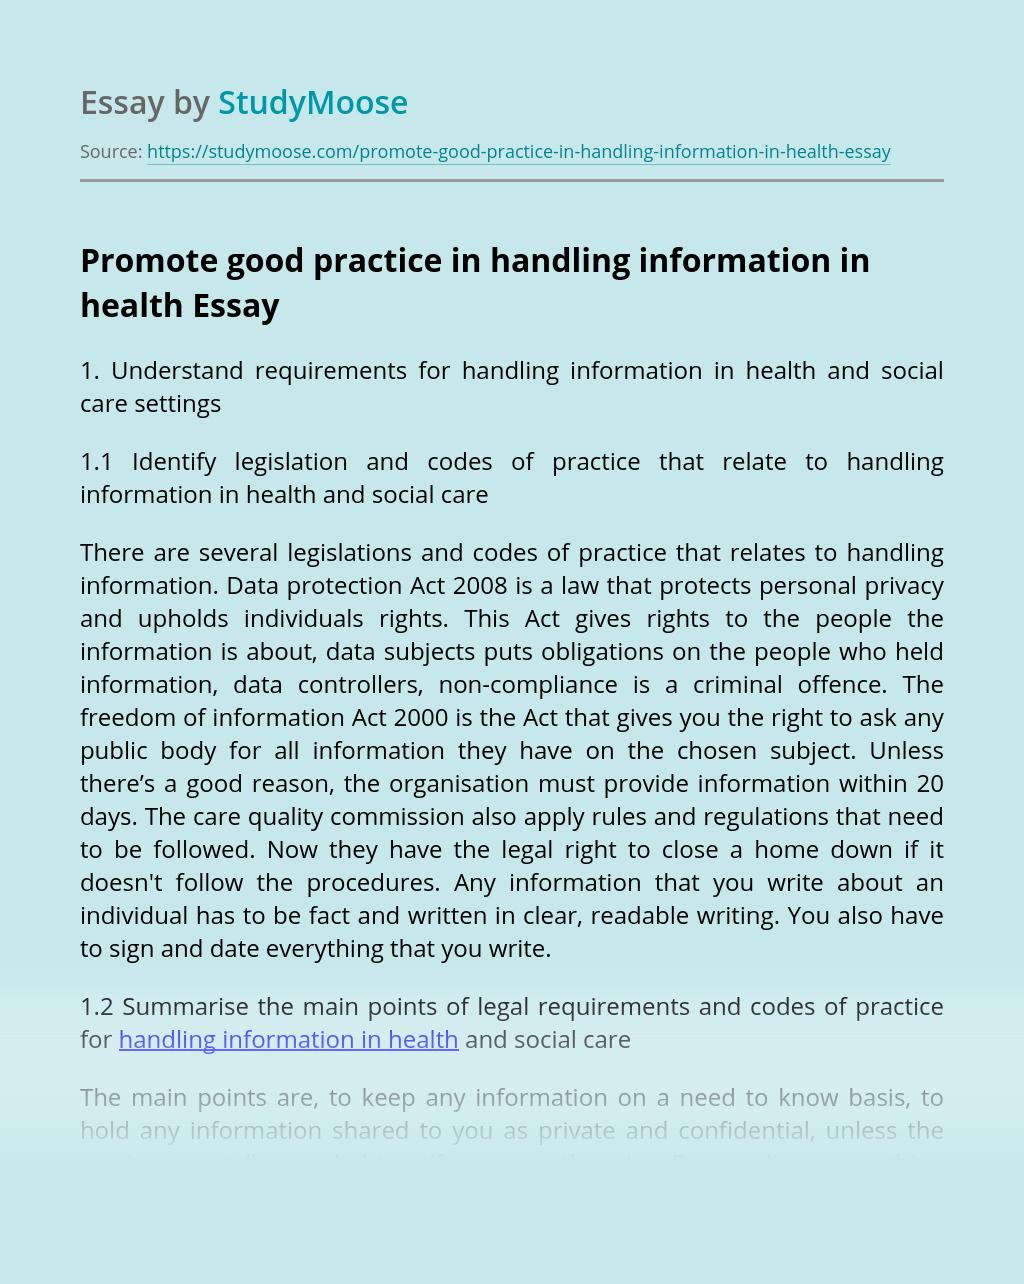 Promote good practice in handling information in health